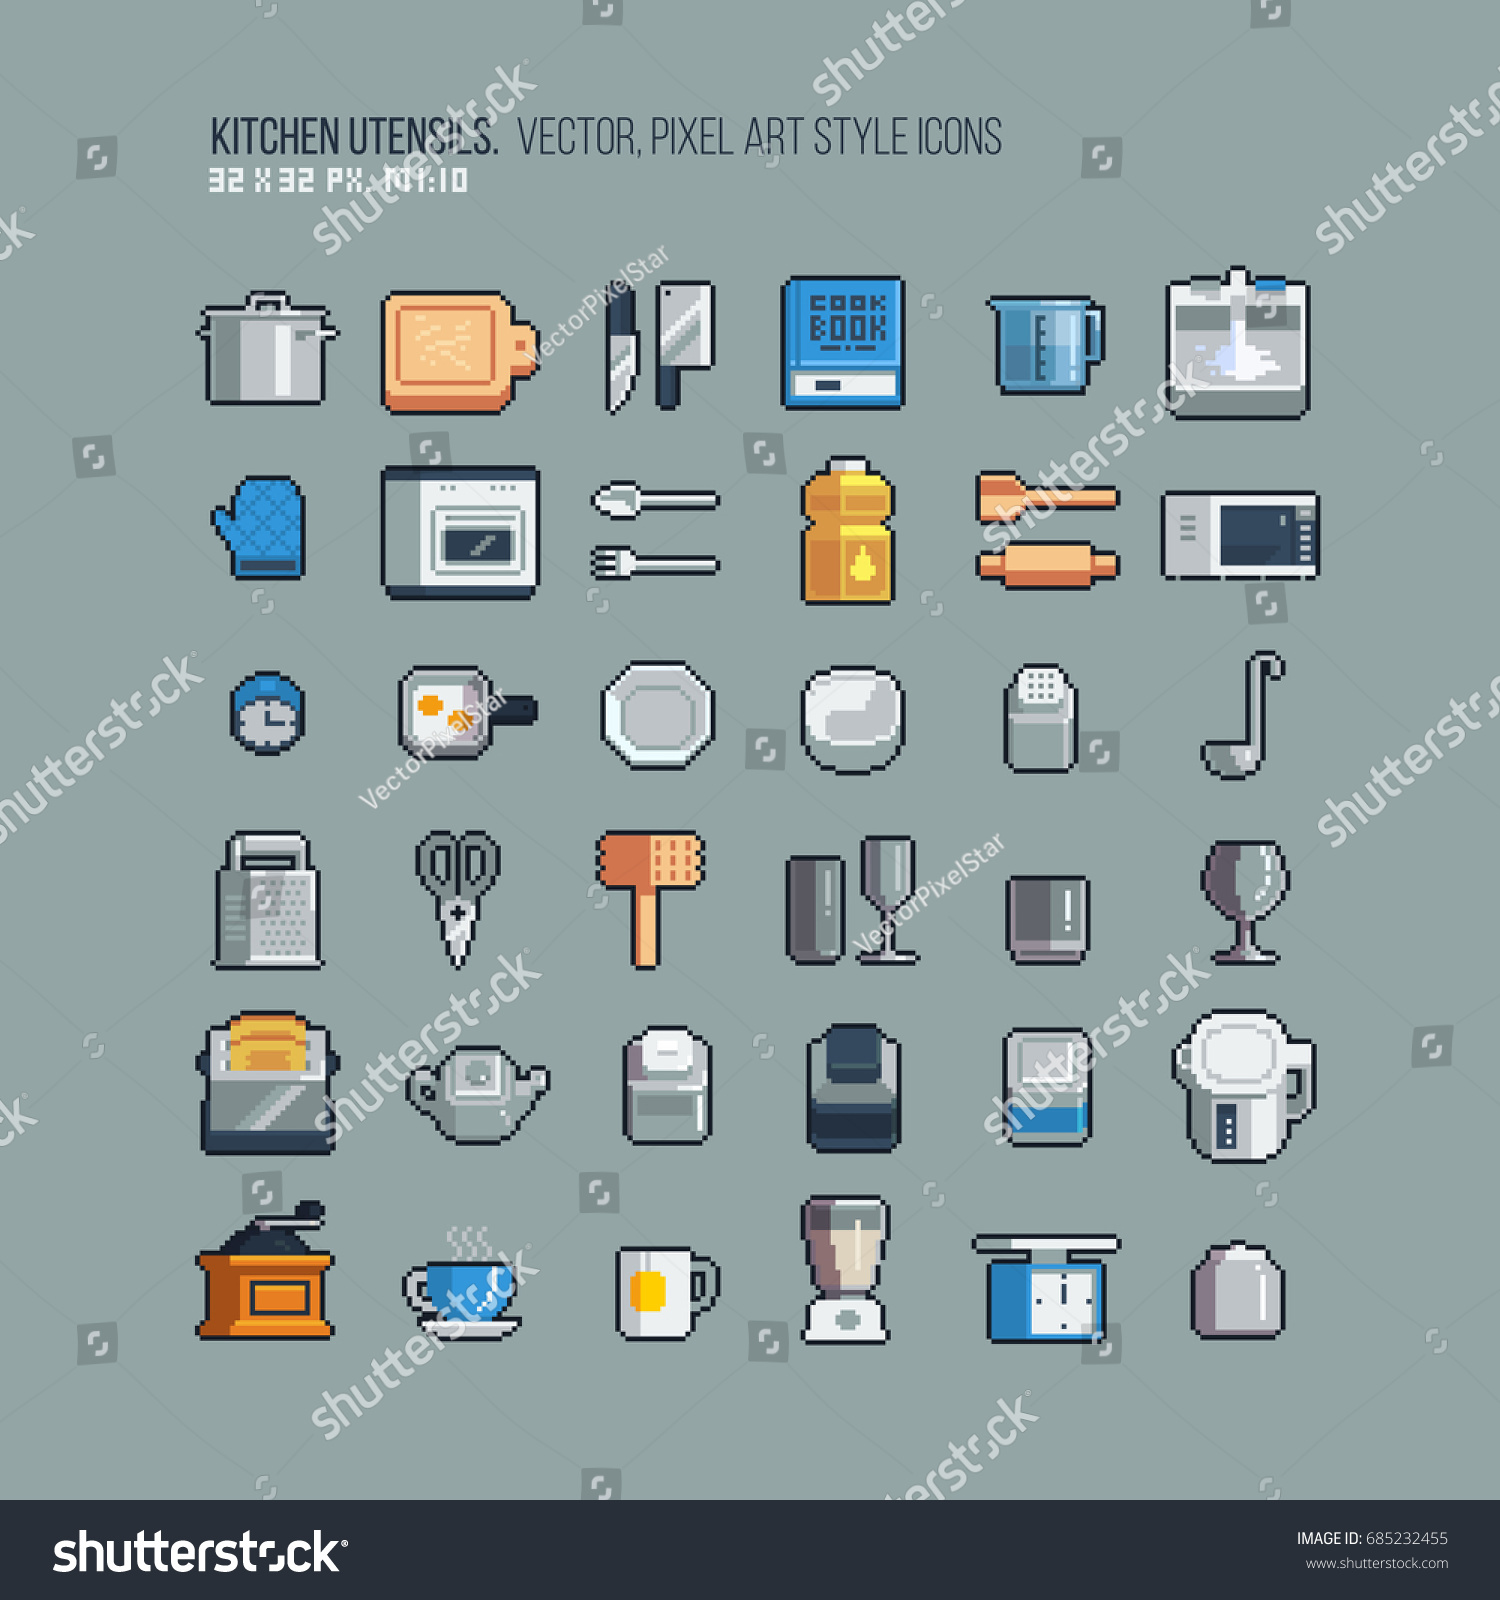 Isometric Pixel Art Kitchen Utensil 32x32 Stock Vector